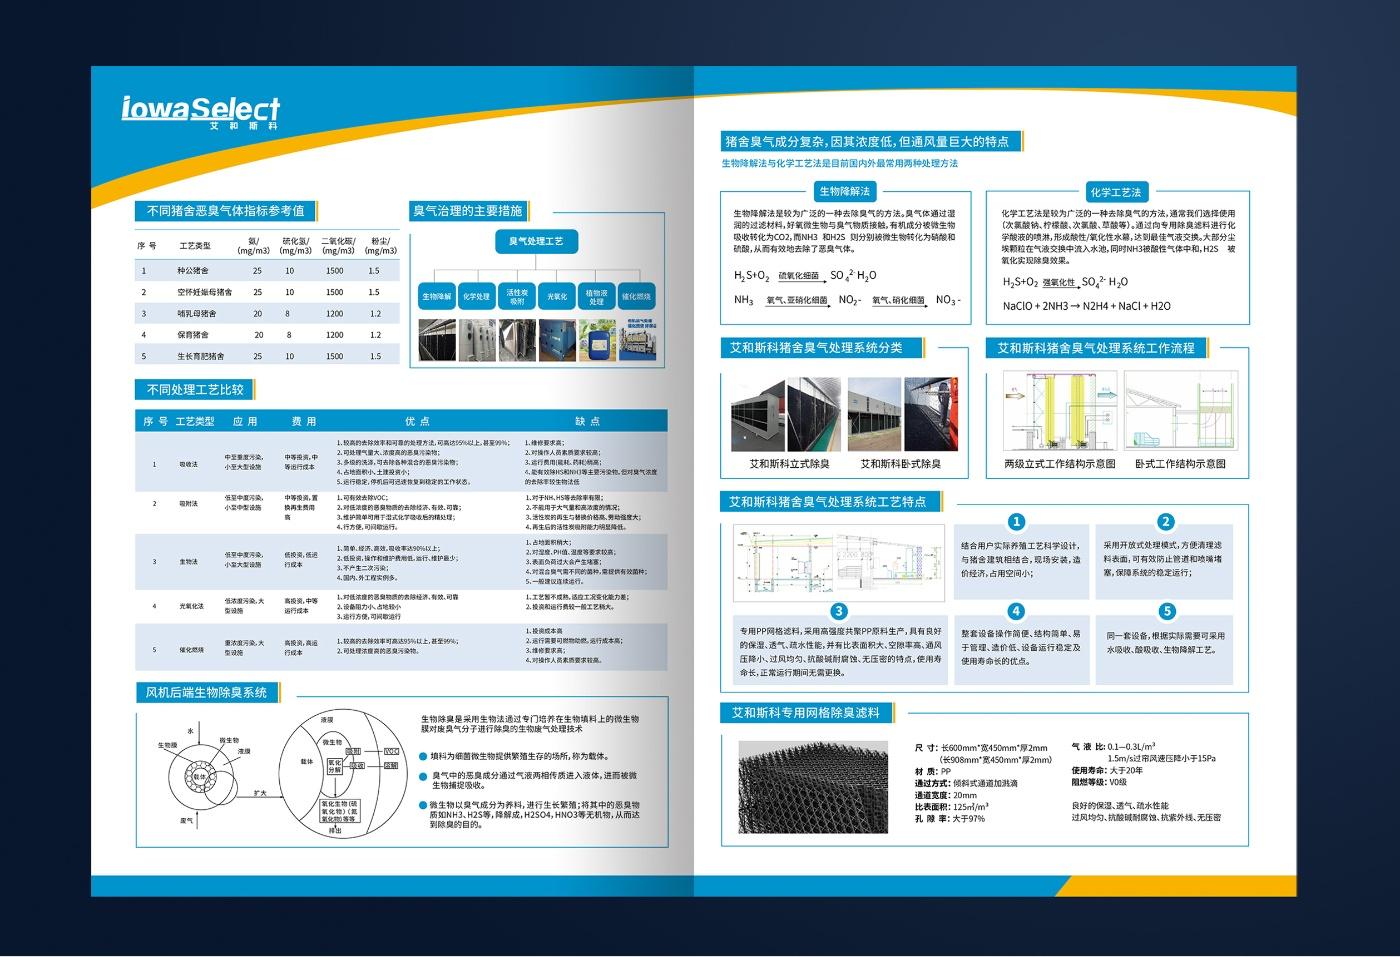 艾和斯科畜牧科技<a href='http://www.6chuangyi.com/case/wuliaosheji/' title='' style='color:;font-weight:bold'>折页设计</a>_04.jpg